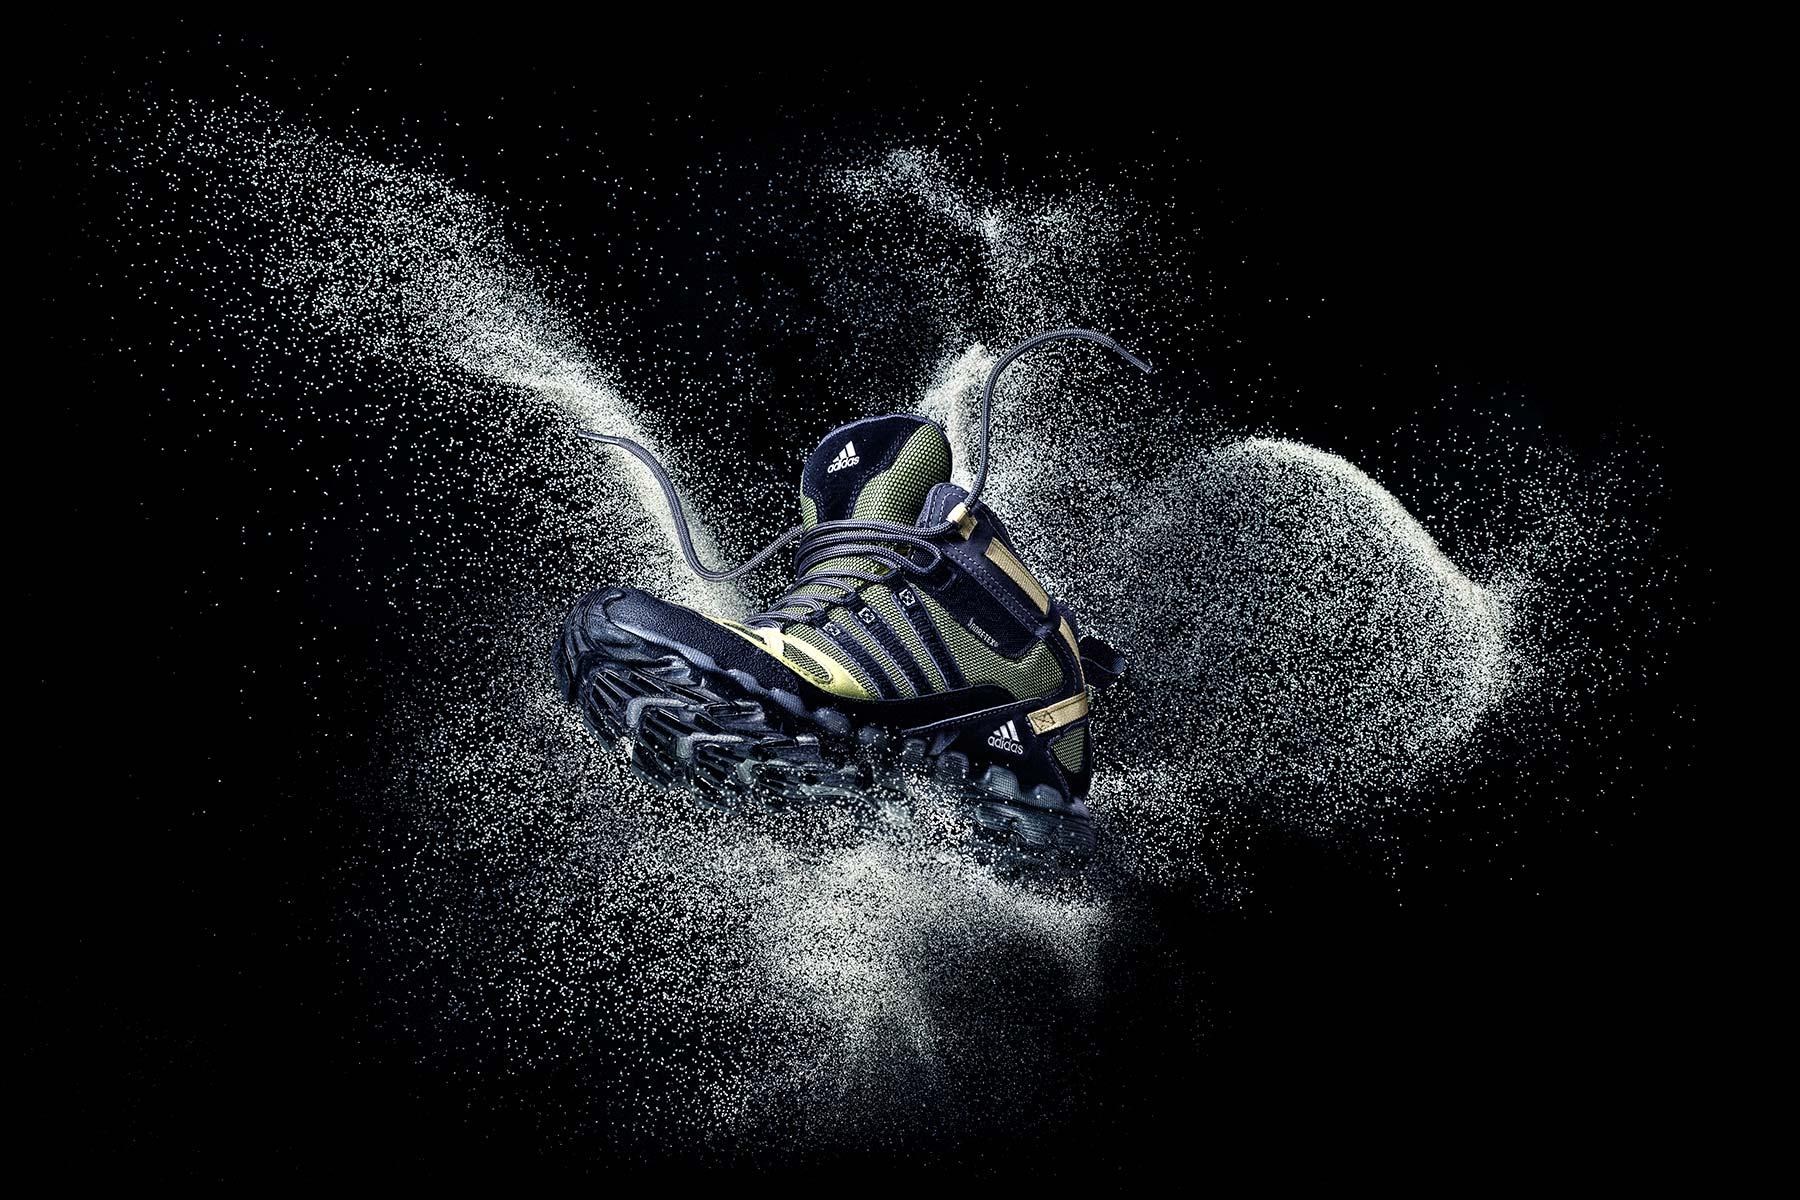 Adidas-Schuh-Produkt-Werbefotograf-Stilllife-Fotograf-Muenchen